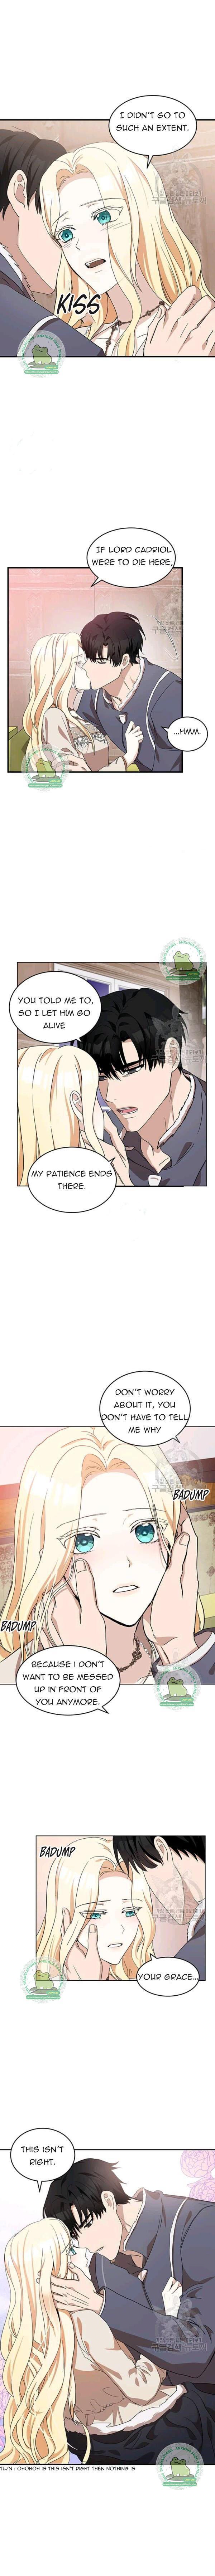 The Villainess Lives Twice Chapter 72 page 8 - Mangakakalots.com